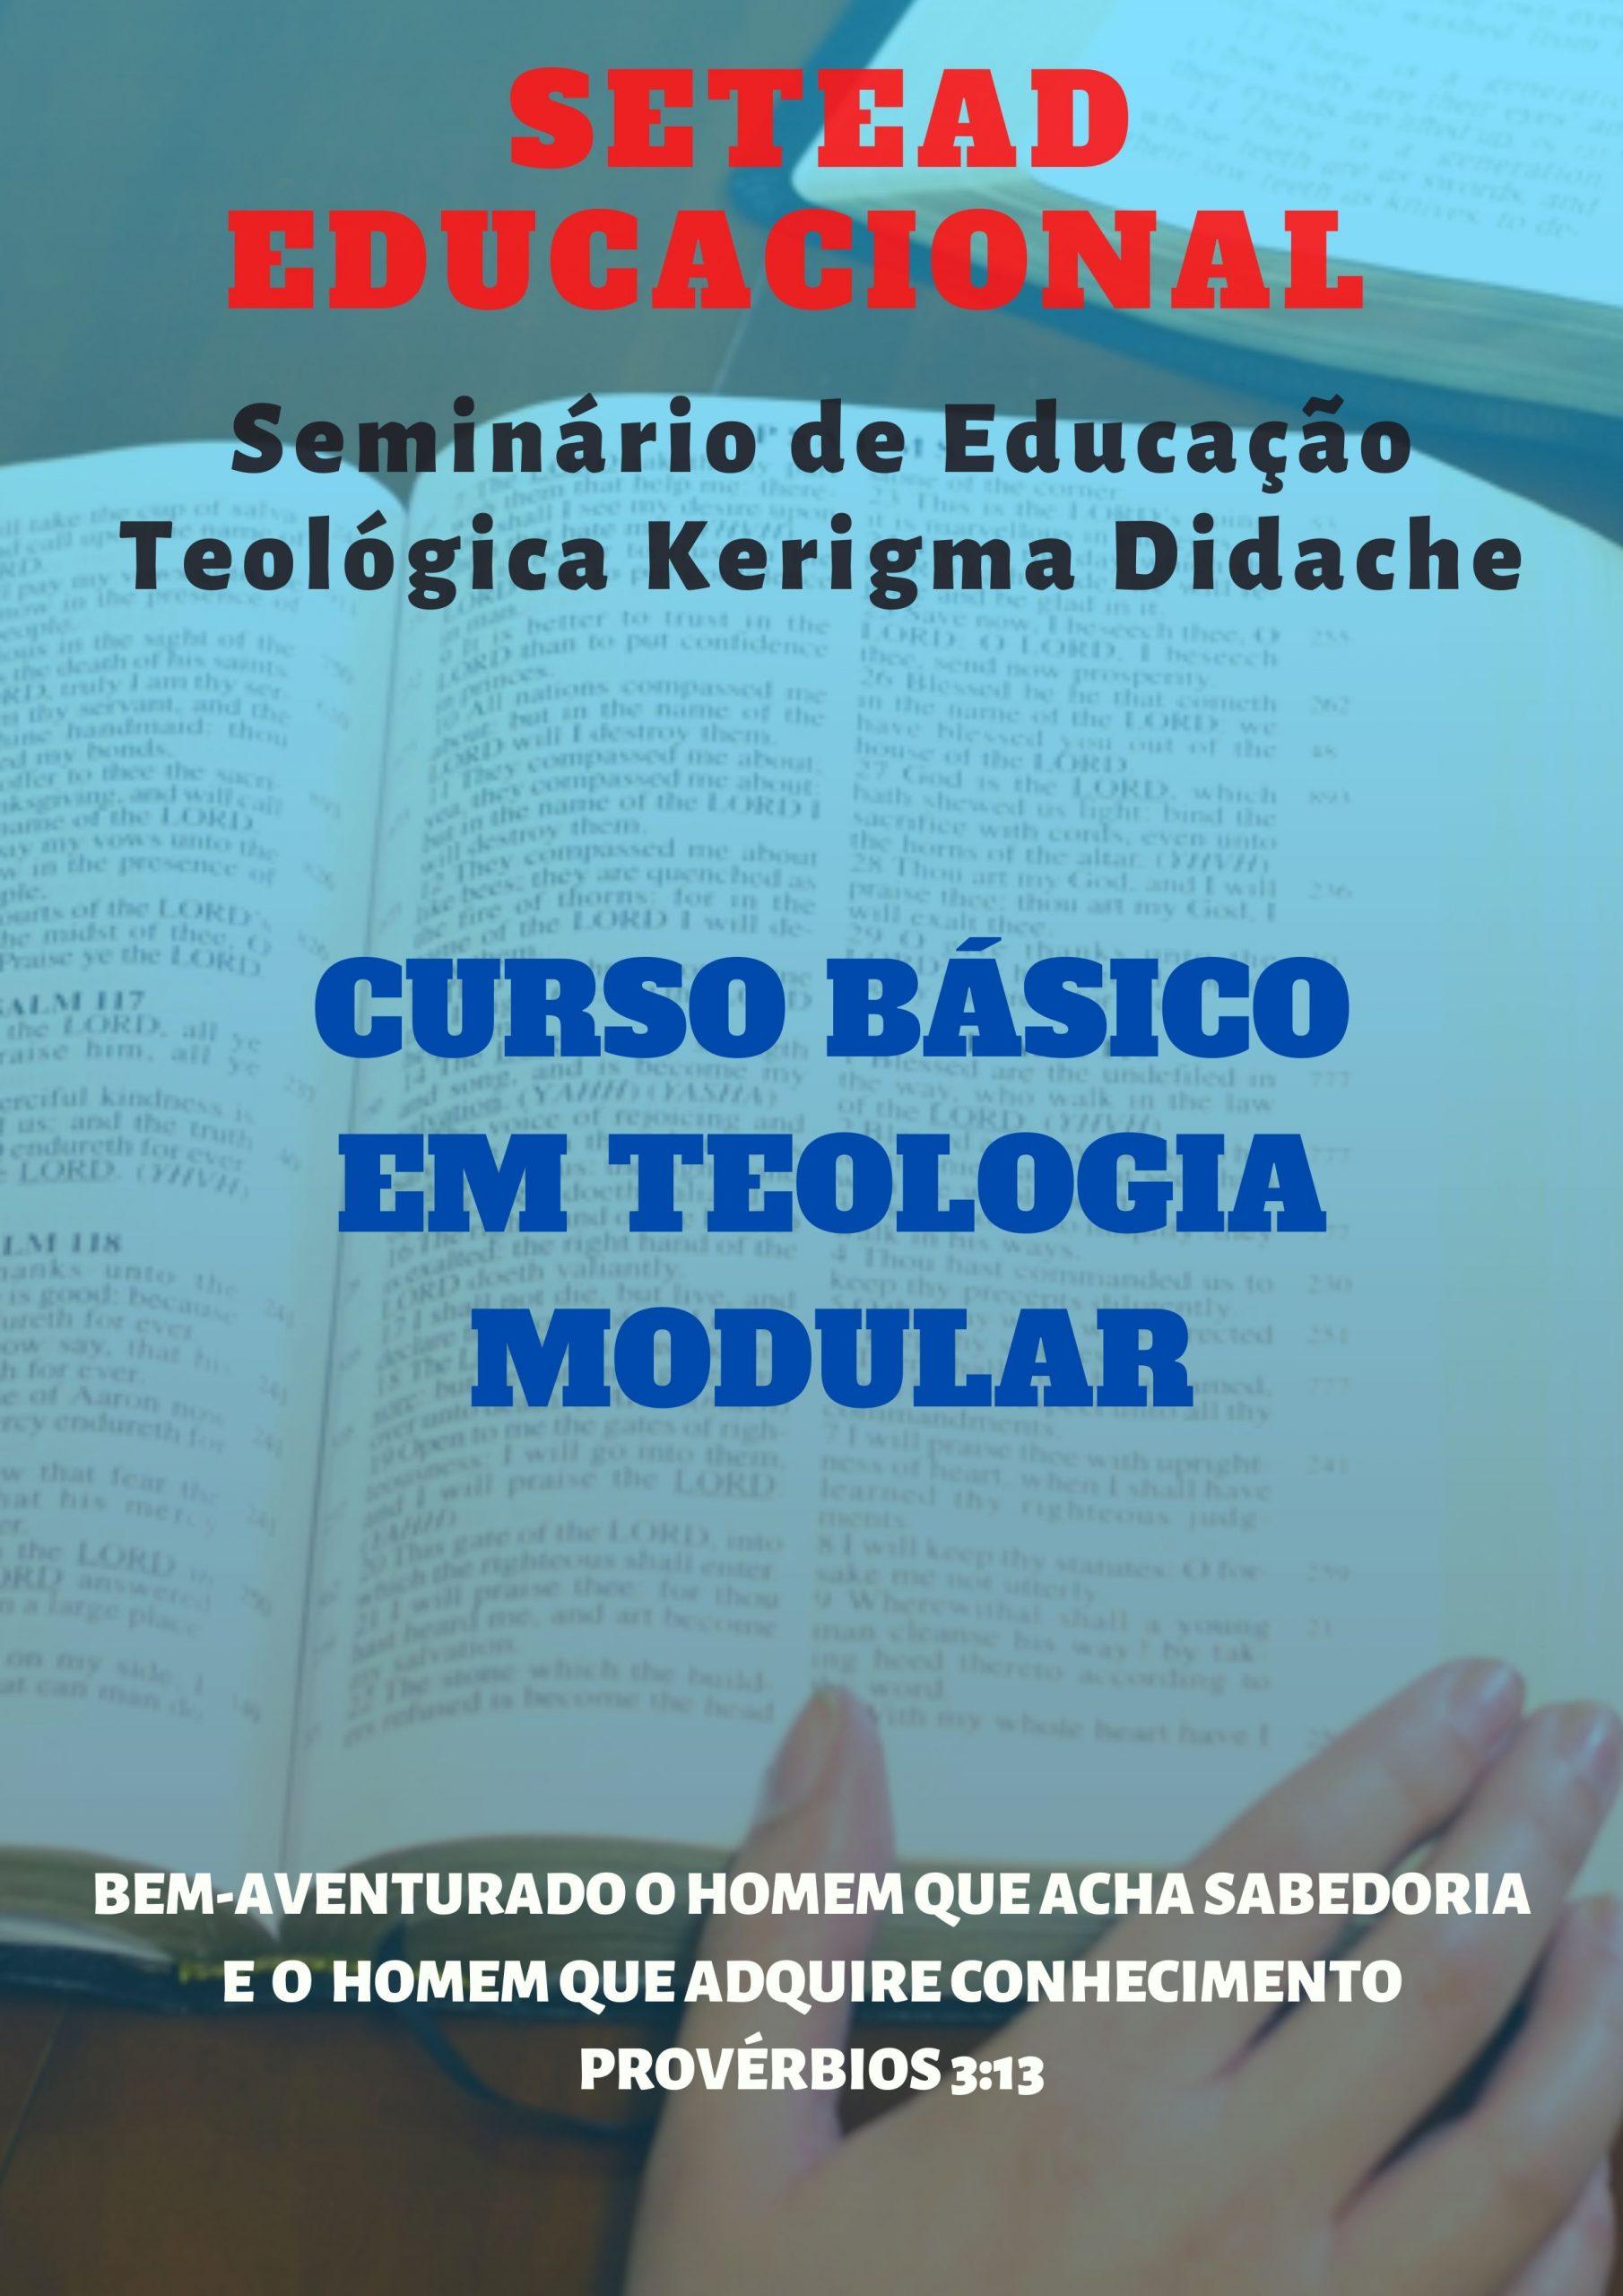 Curso Básico em Teologia Modular post thumbnail image